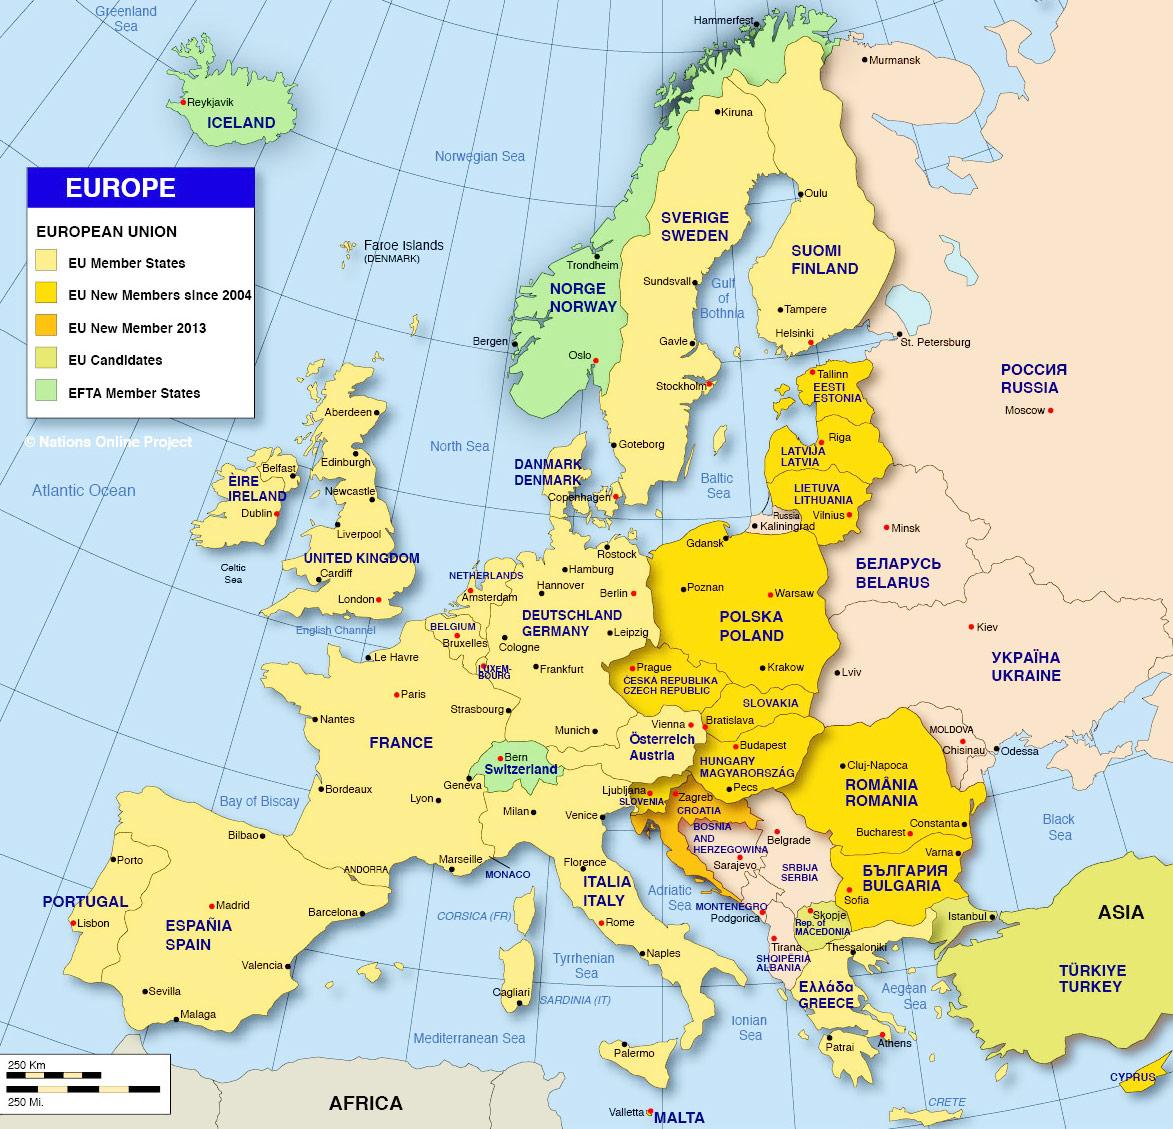 Map Europe 2016.Religion Map Europe 2016